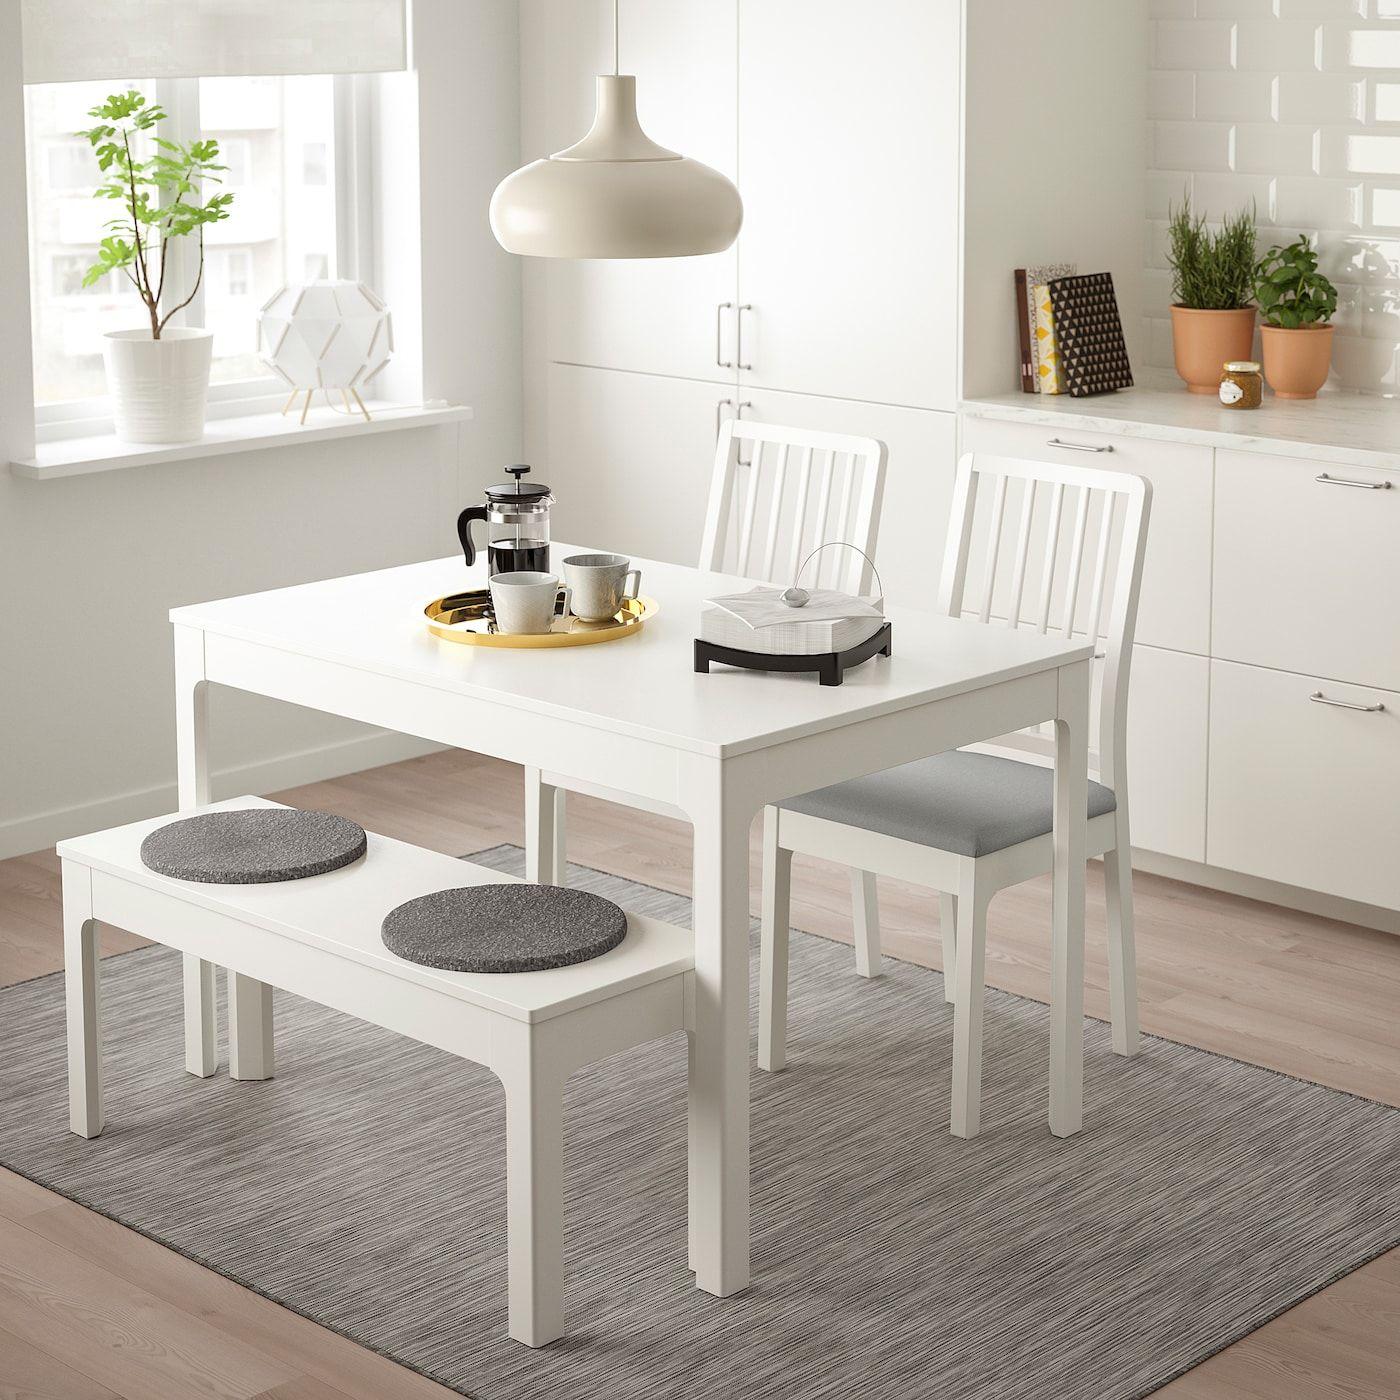 IKEA US Furniture and Home Furnishings   Ikea dining, Ikea